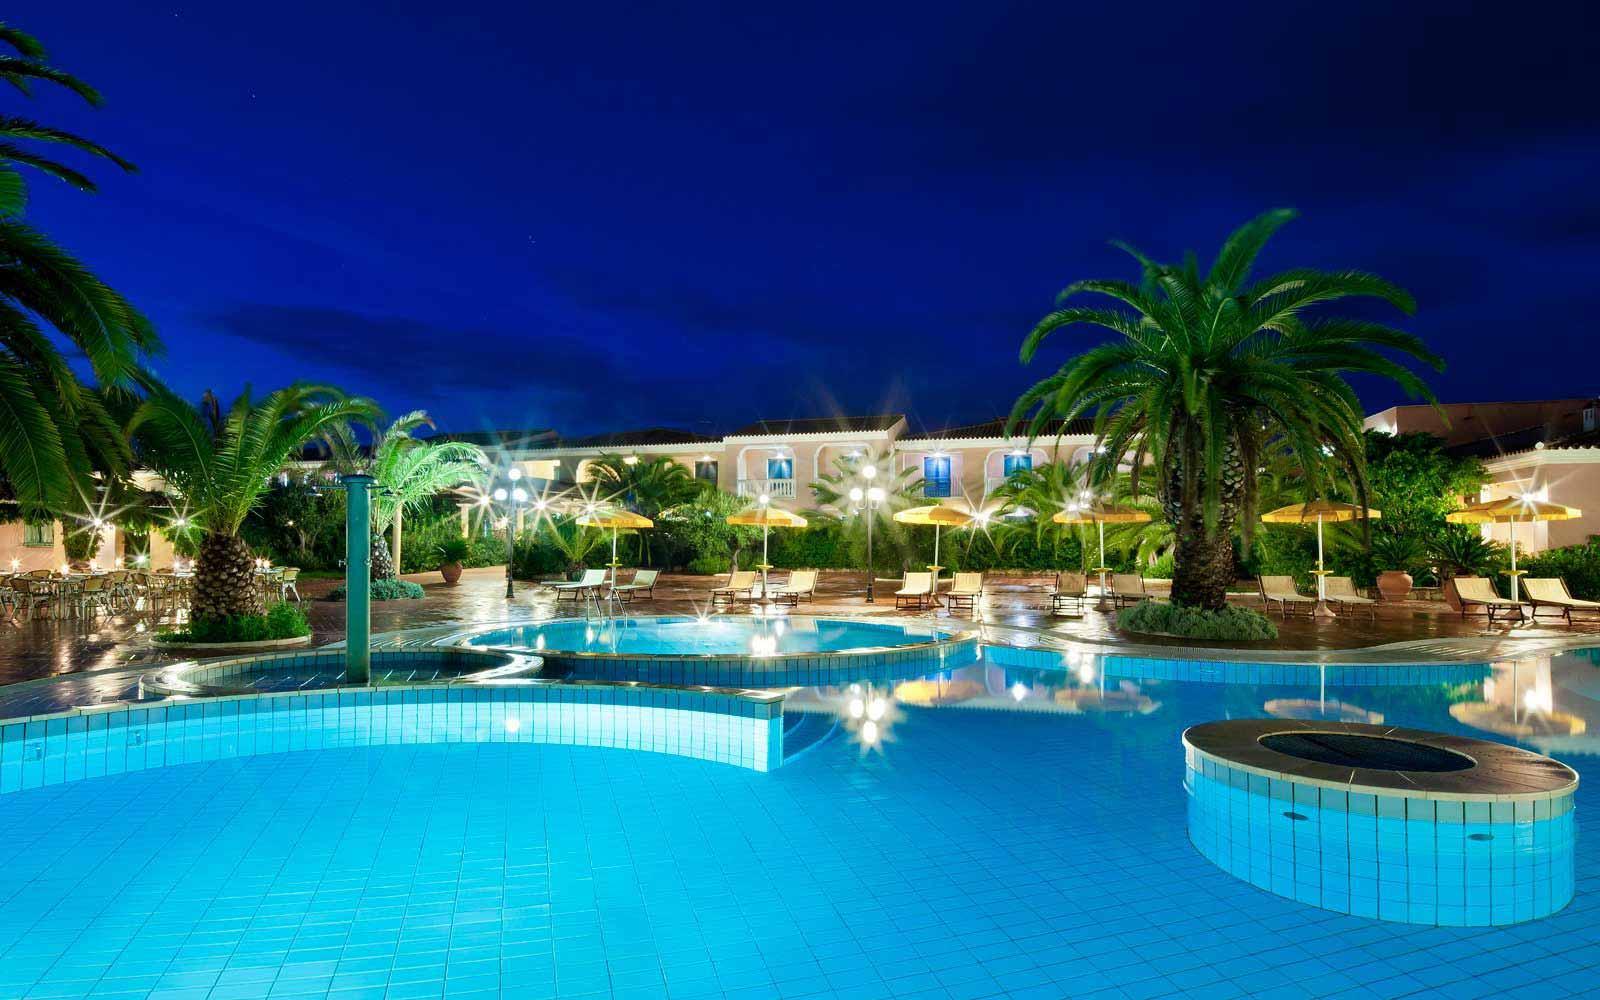 I giardini di cala ginepro sardinia 4 beach holidays - I giardini di cala ginepro ...